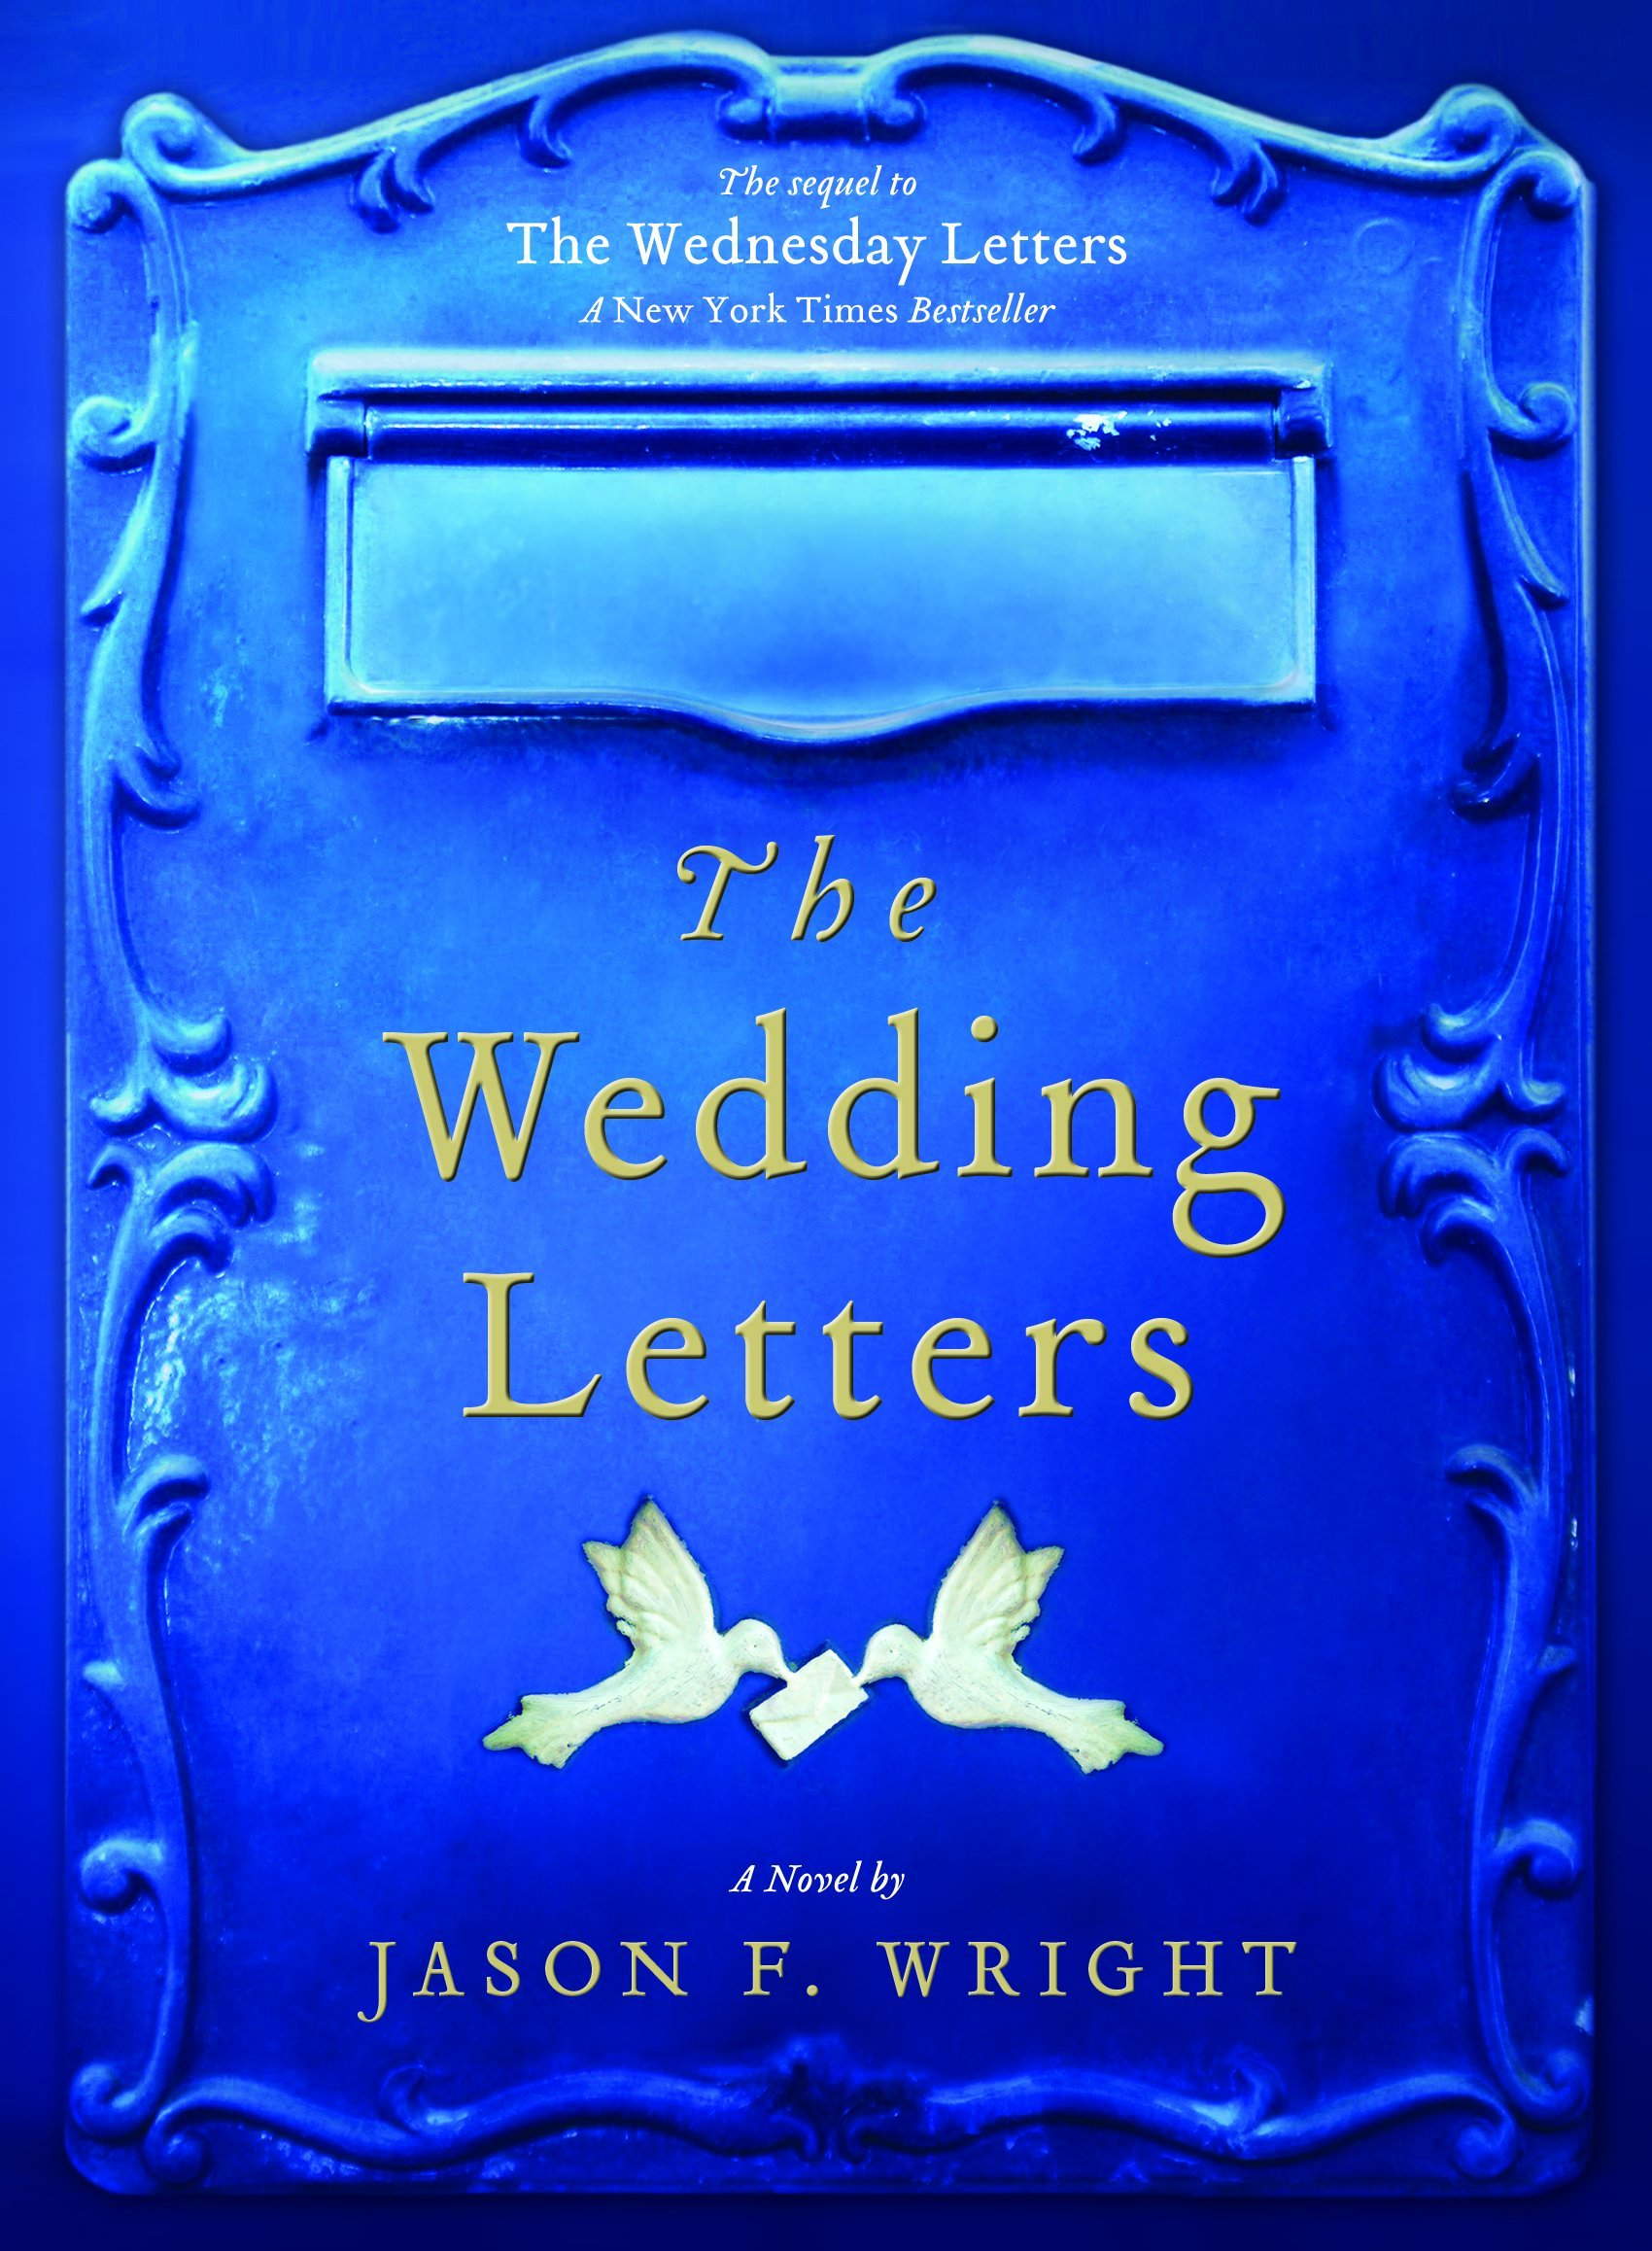 the wedding letters wednesday letters jason f wright 0783027080575 amazoncom books